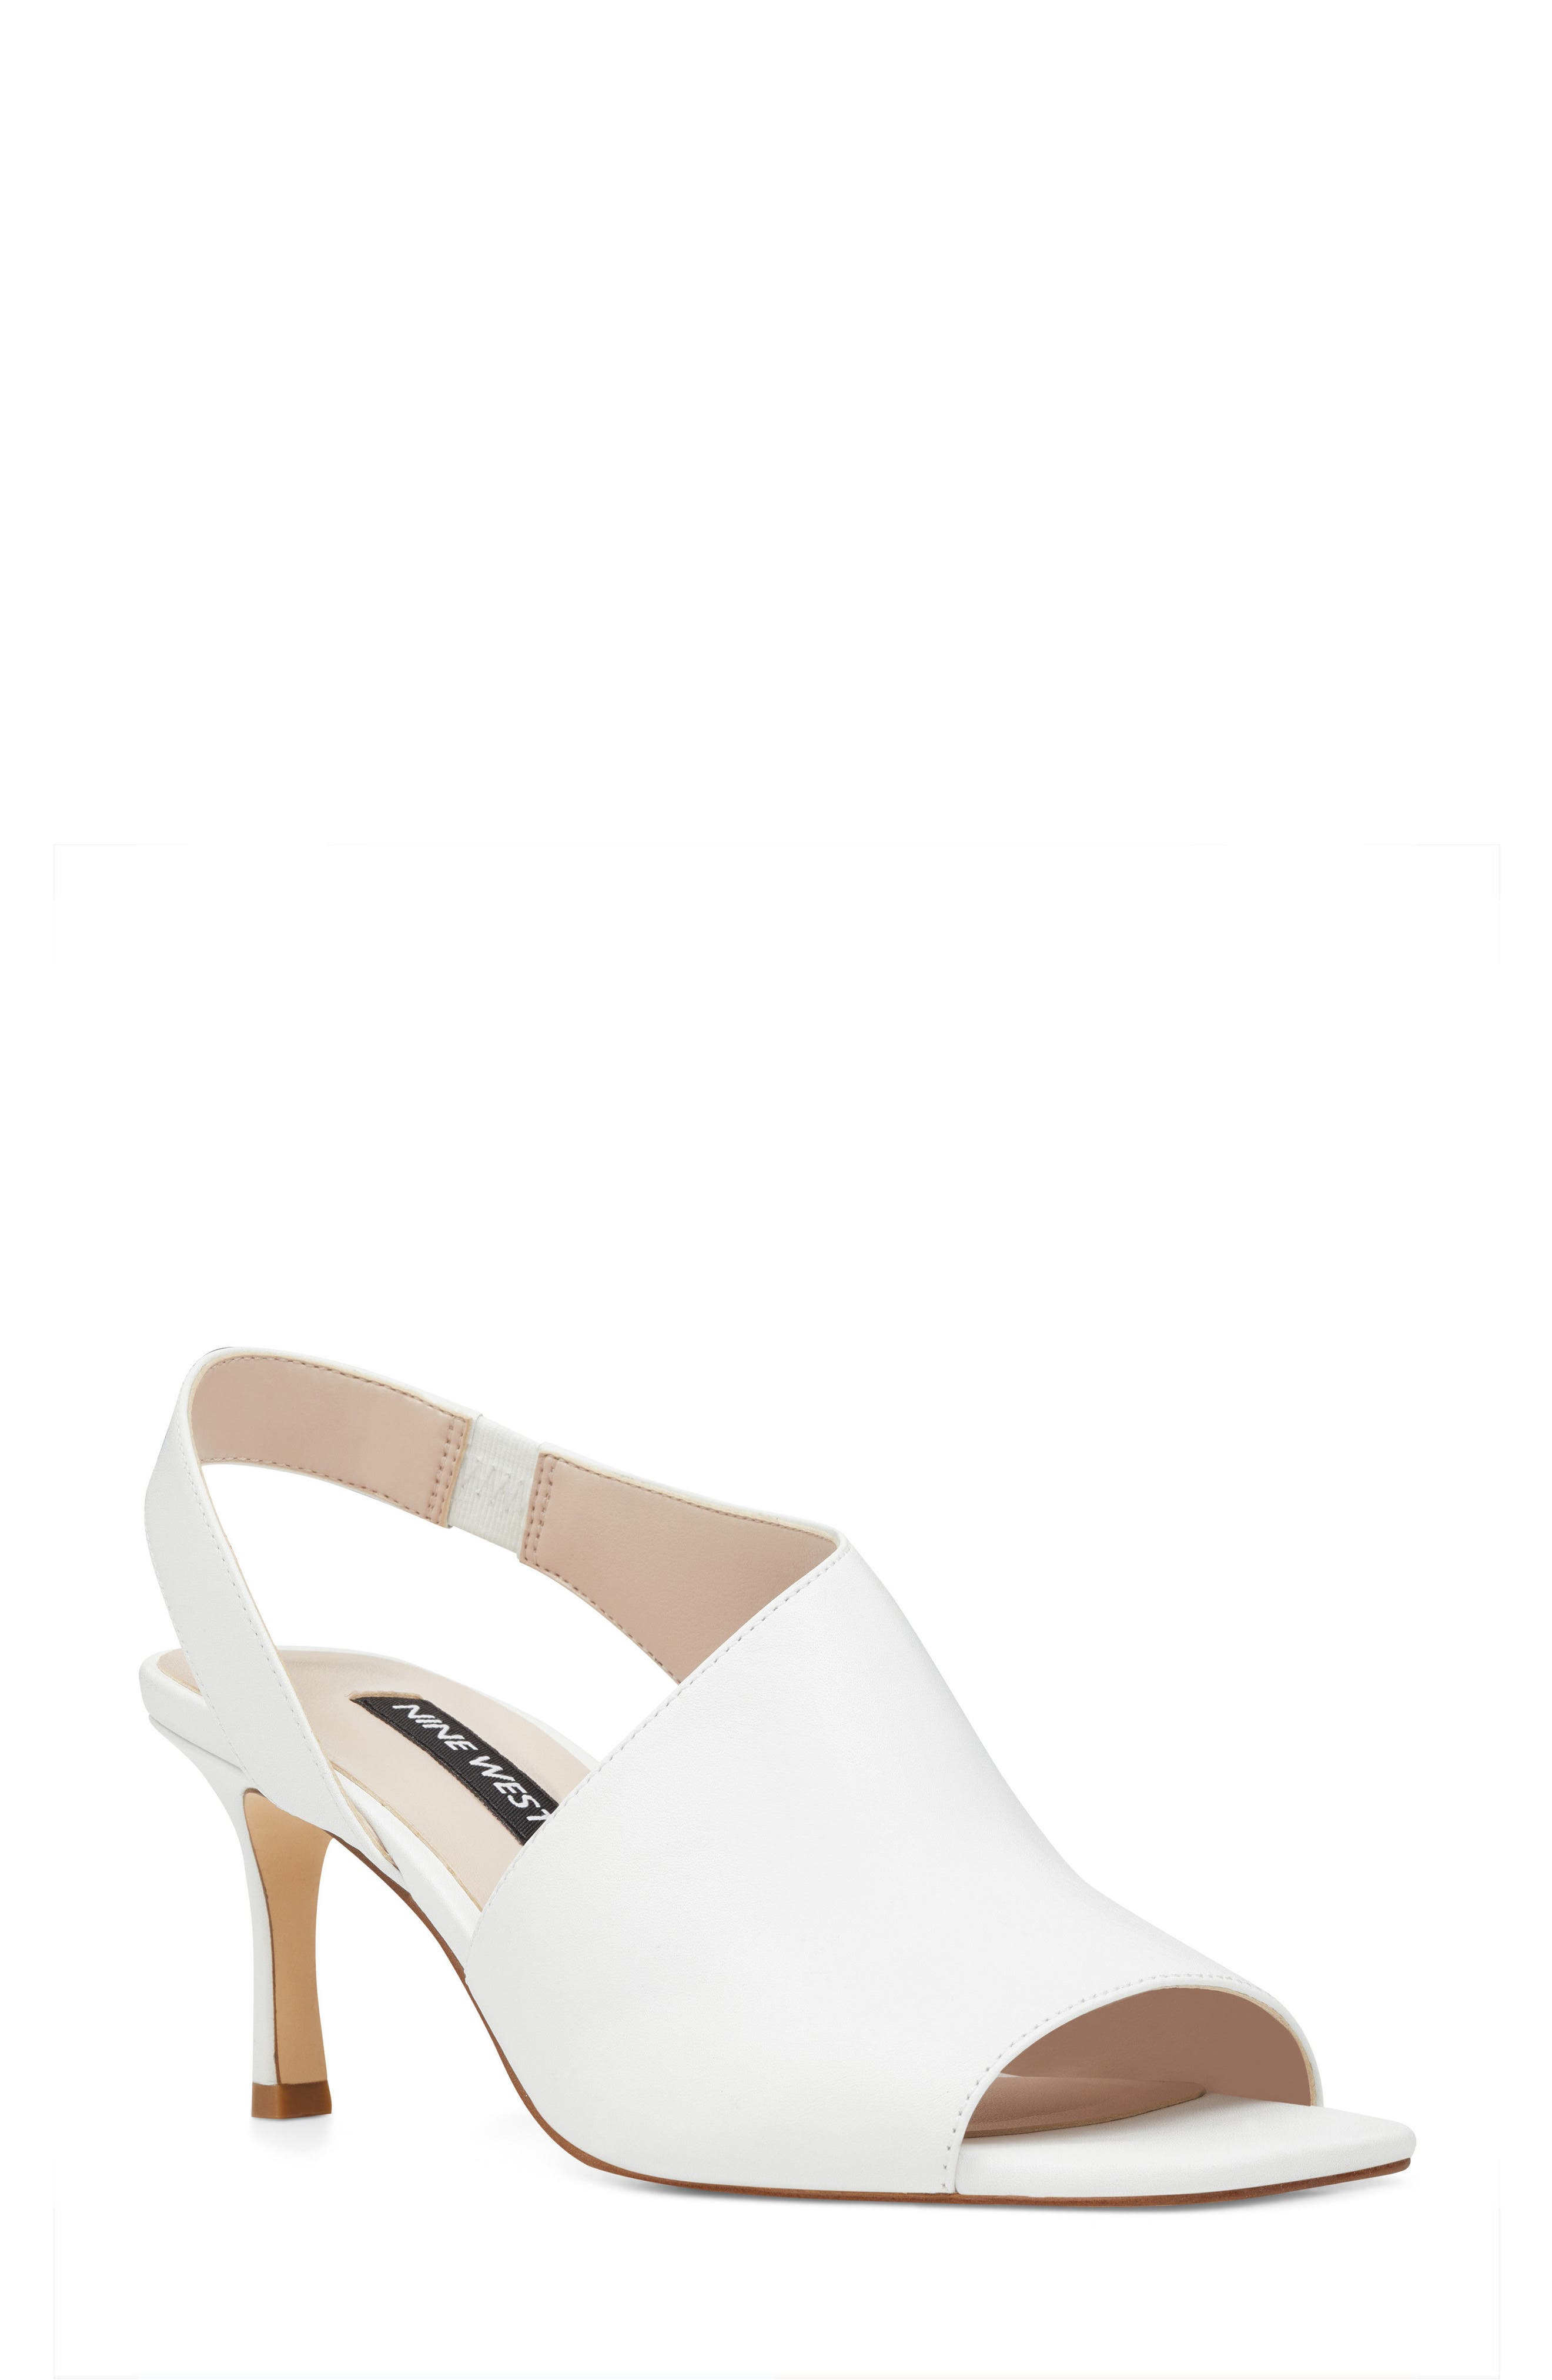 Orrus Asymmetrical Sandal,                             Main thumbnail 1, color,                             White Leather